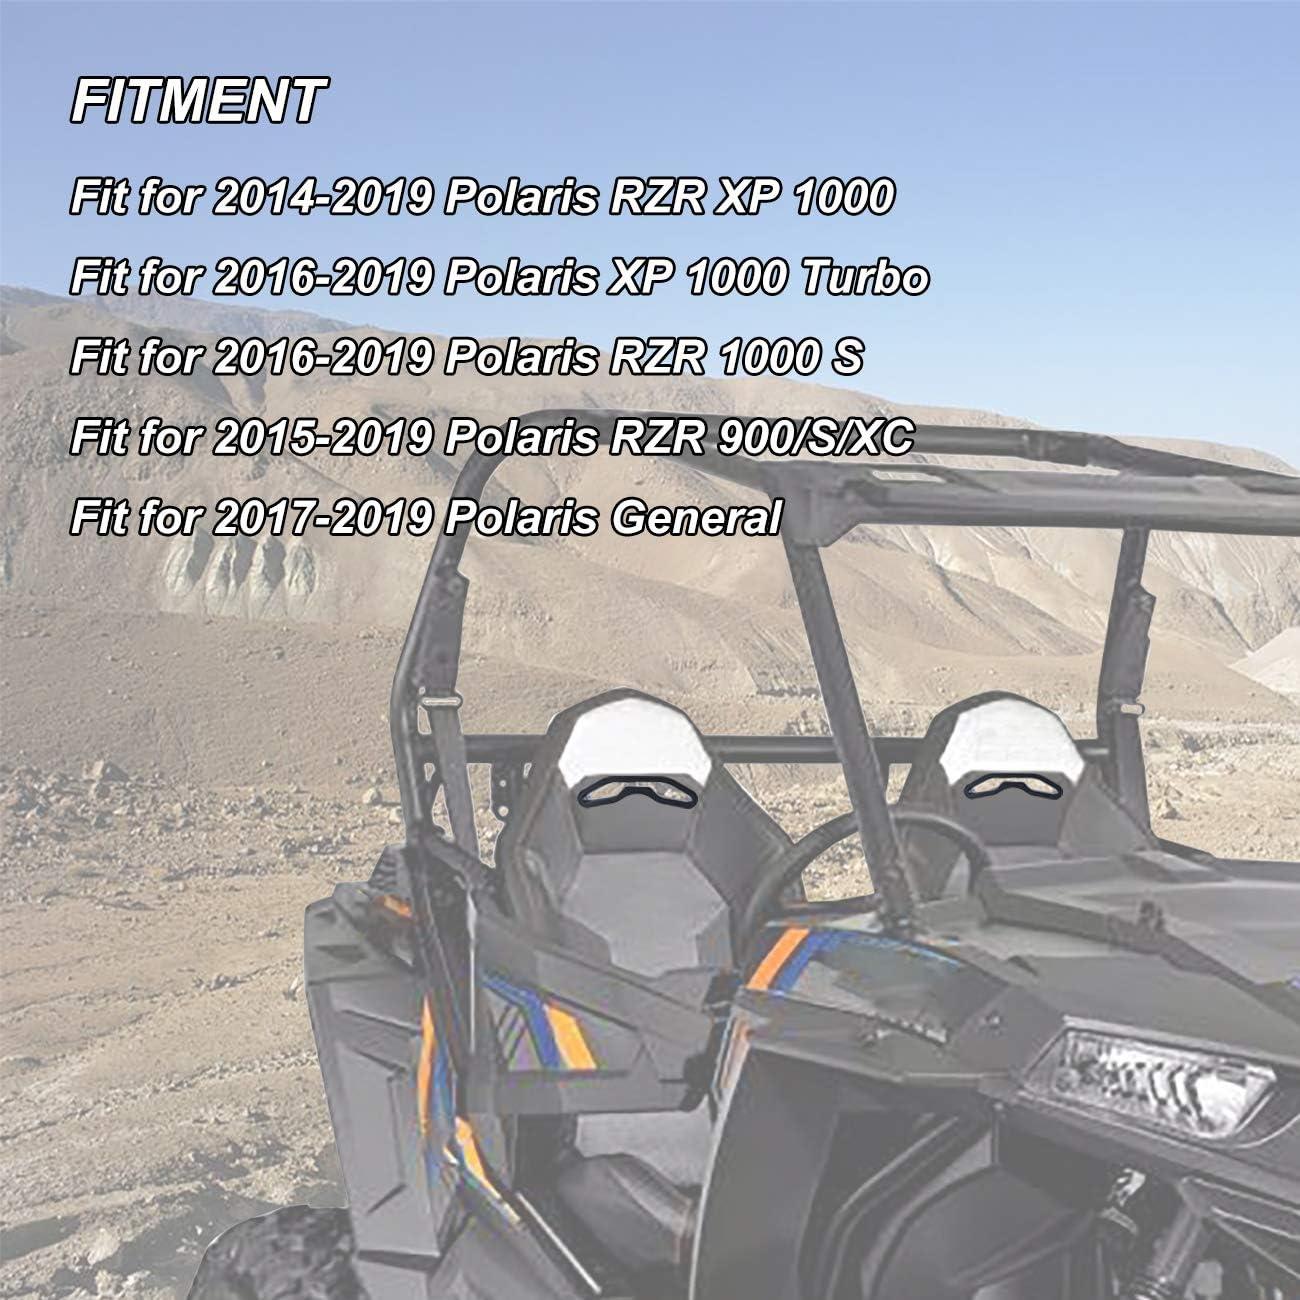 2 PCS AUFER Harness Pass Through Bezel Fits for 2014-2019 Polaris RZR XP 1000 900 S XC General